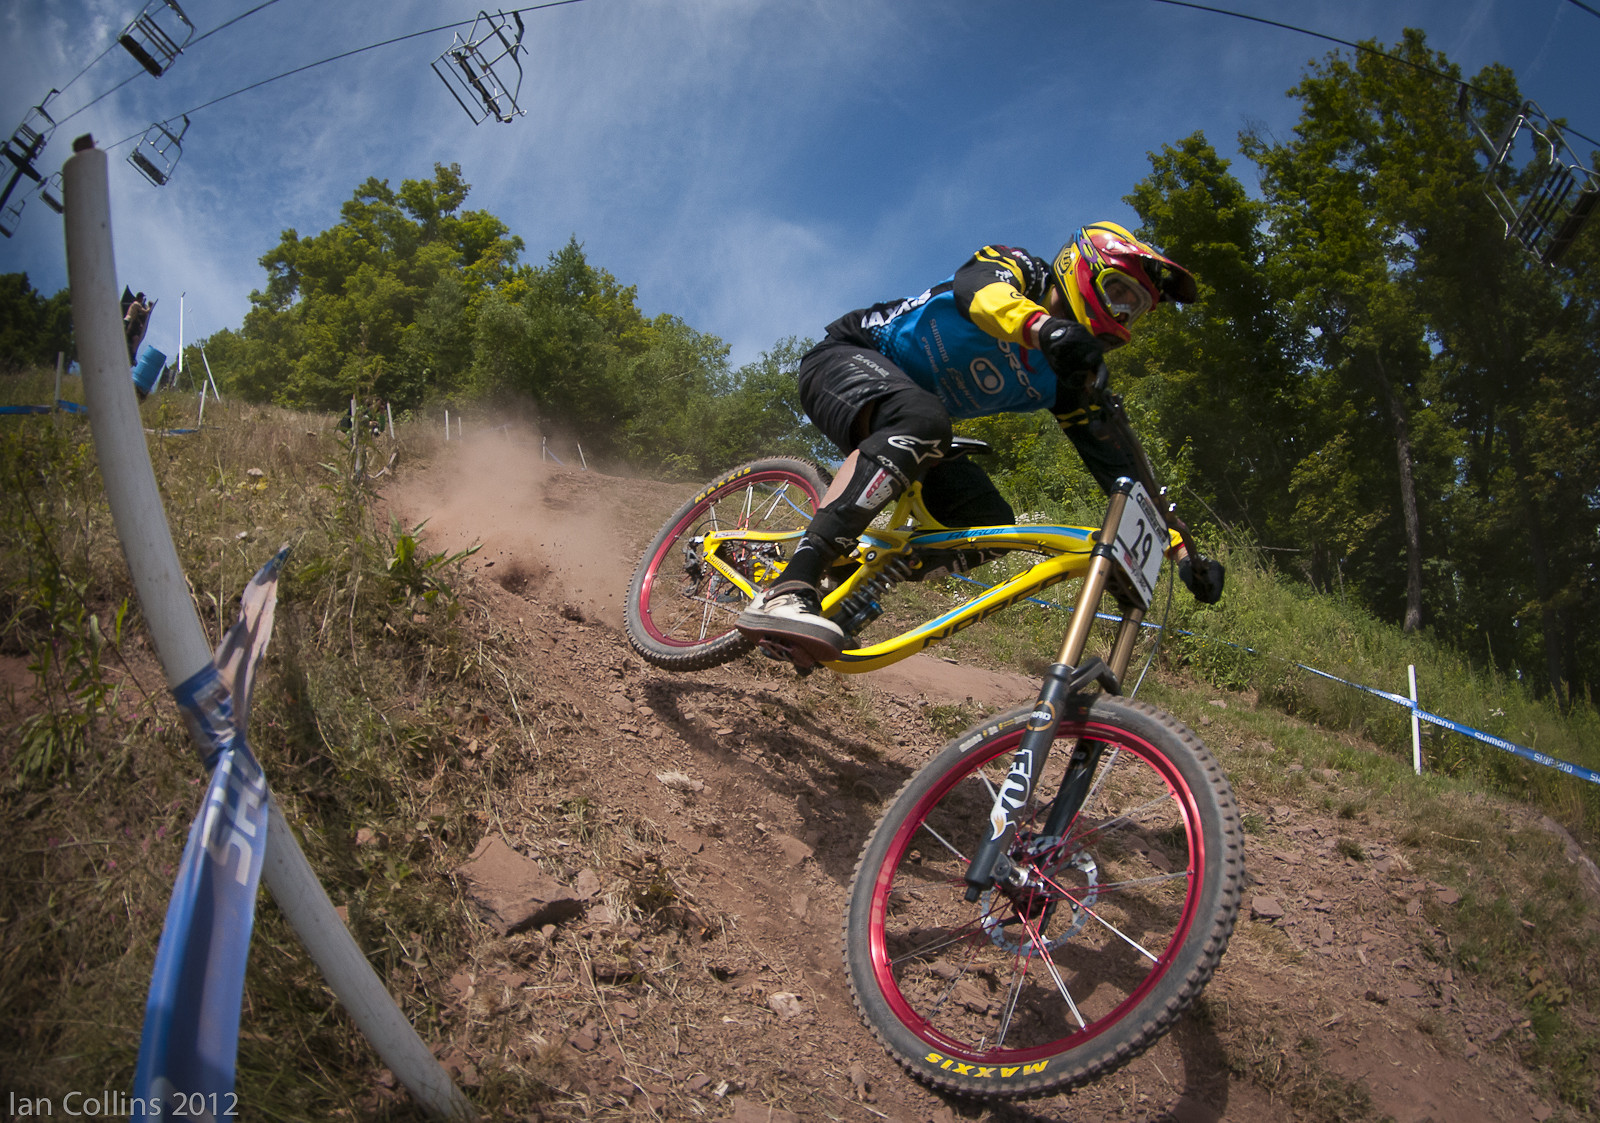 Bryn Atkinson - Ian Collins - Mountain Biking Pictures - Vital MTB